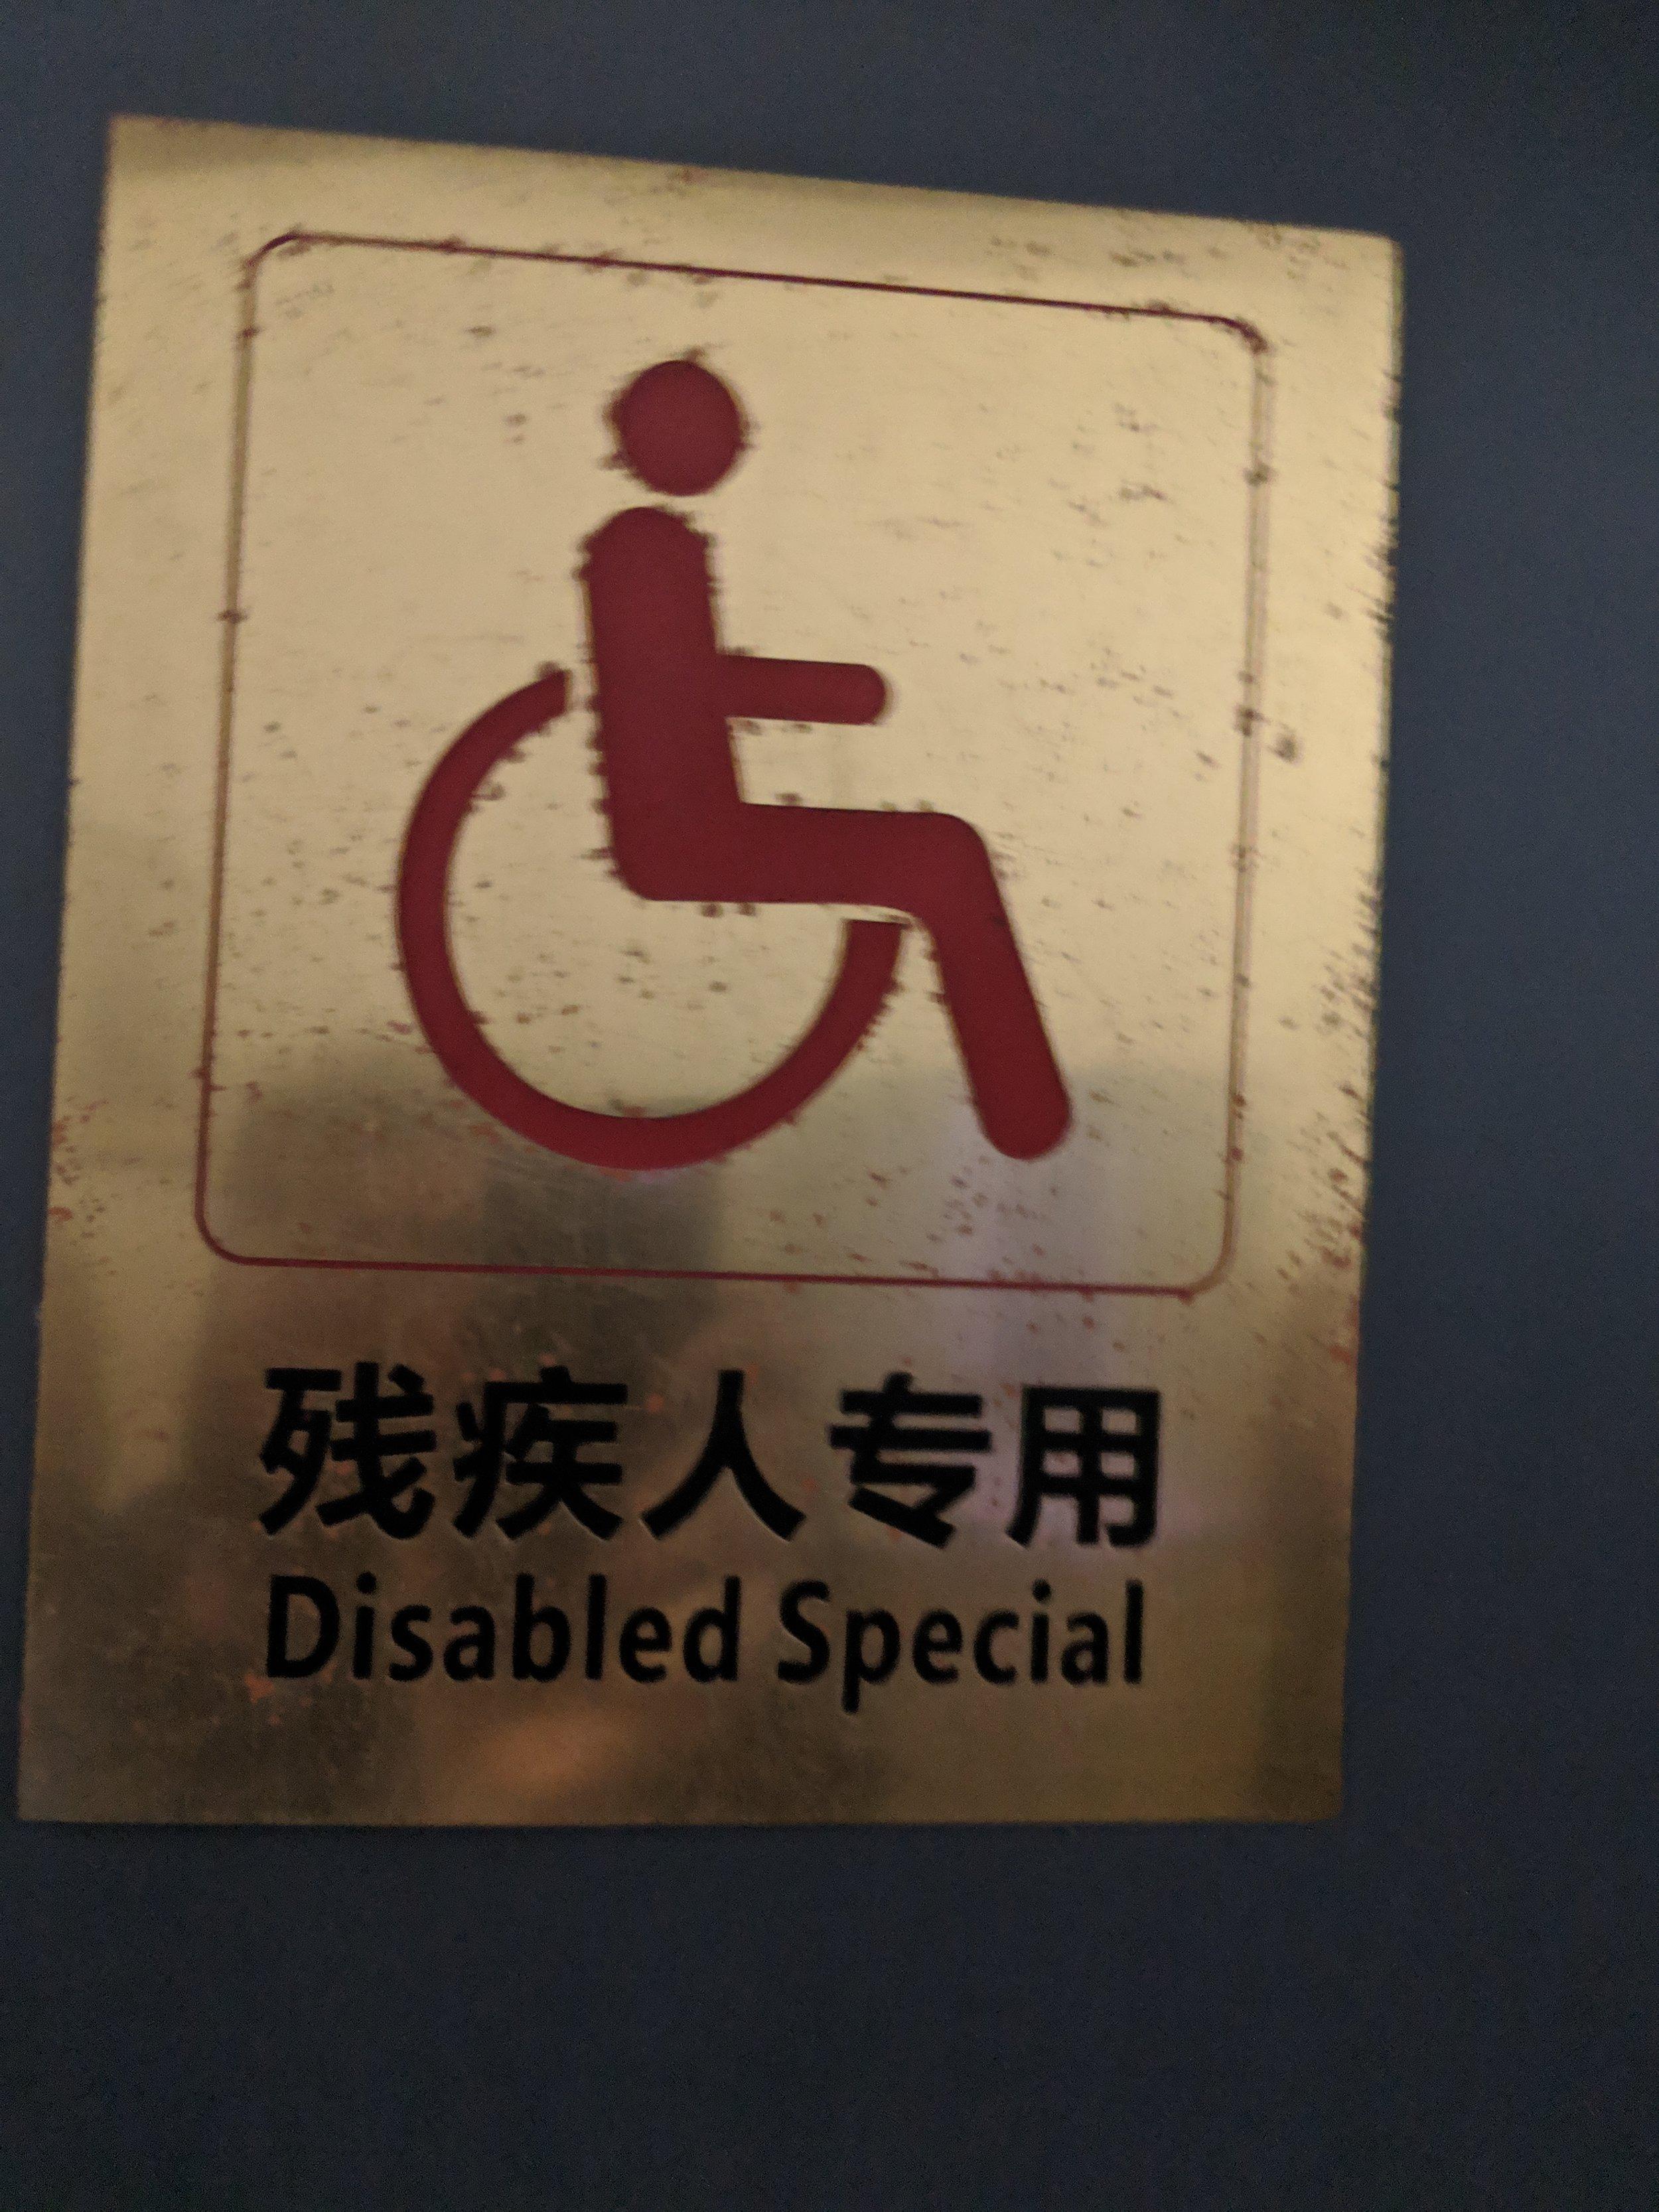 Special.